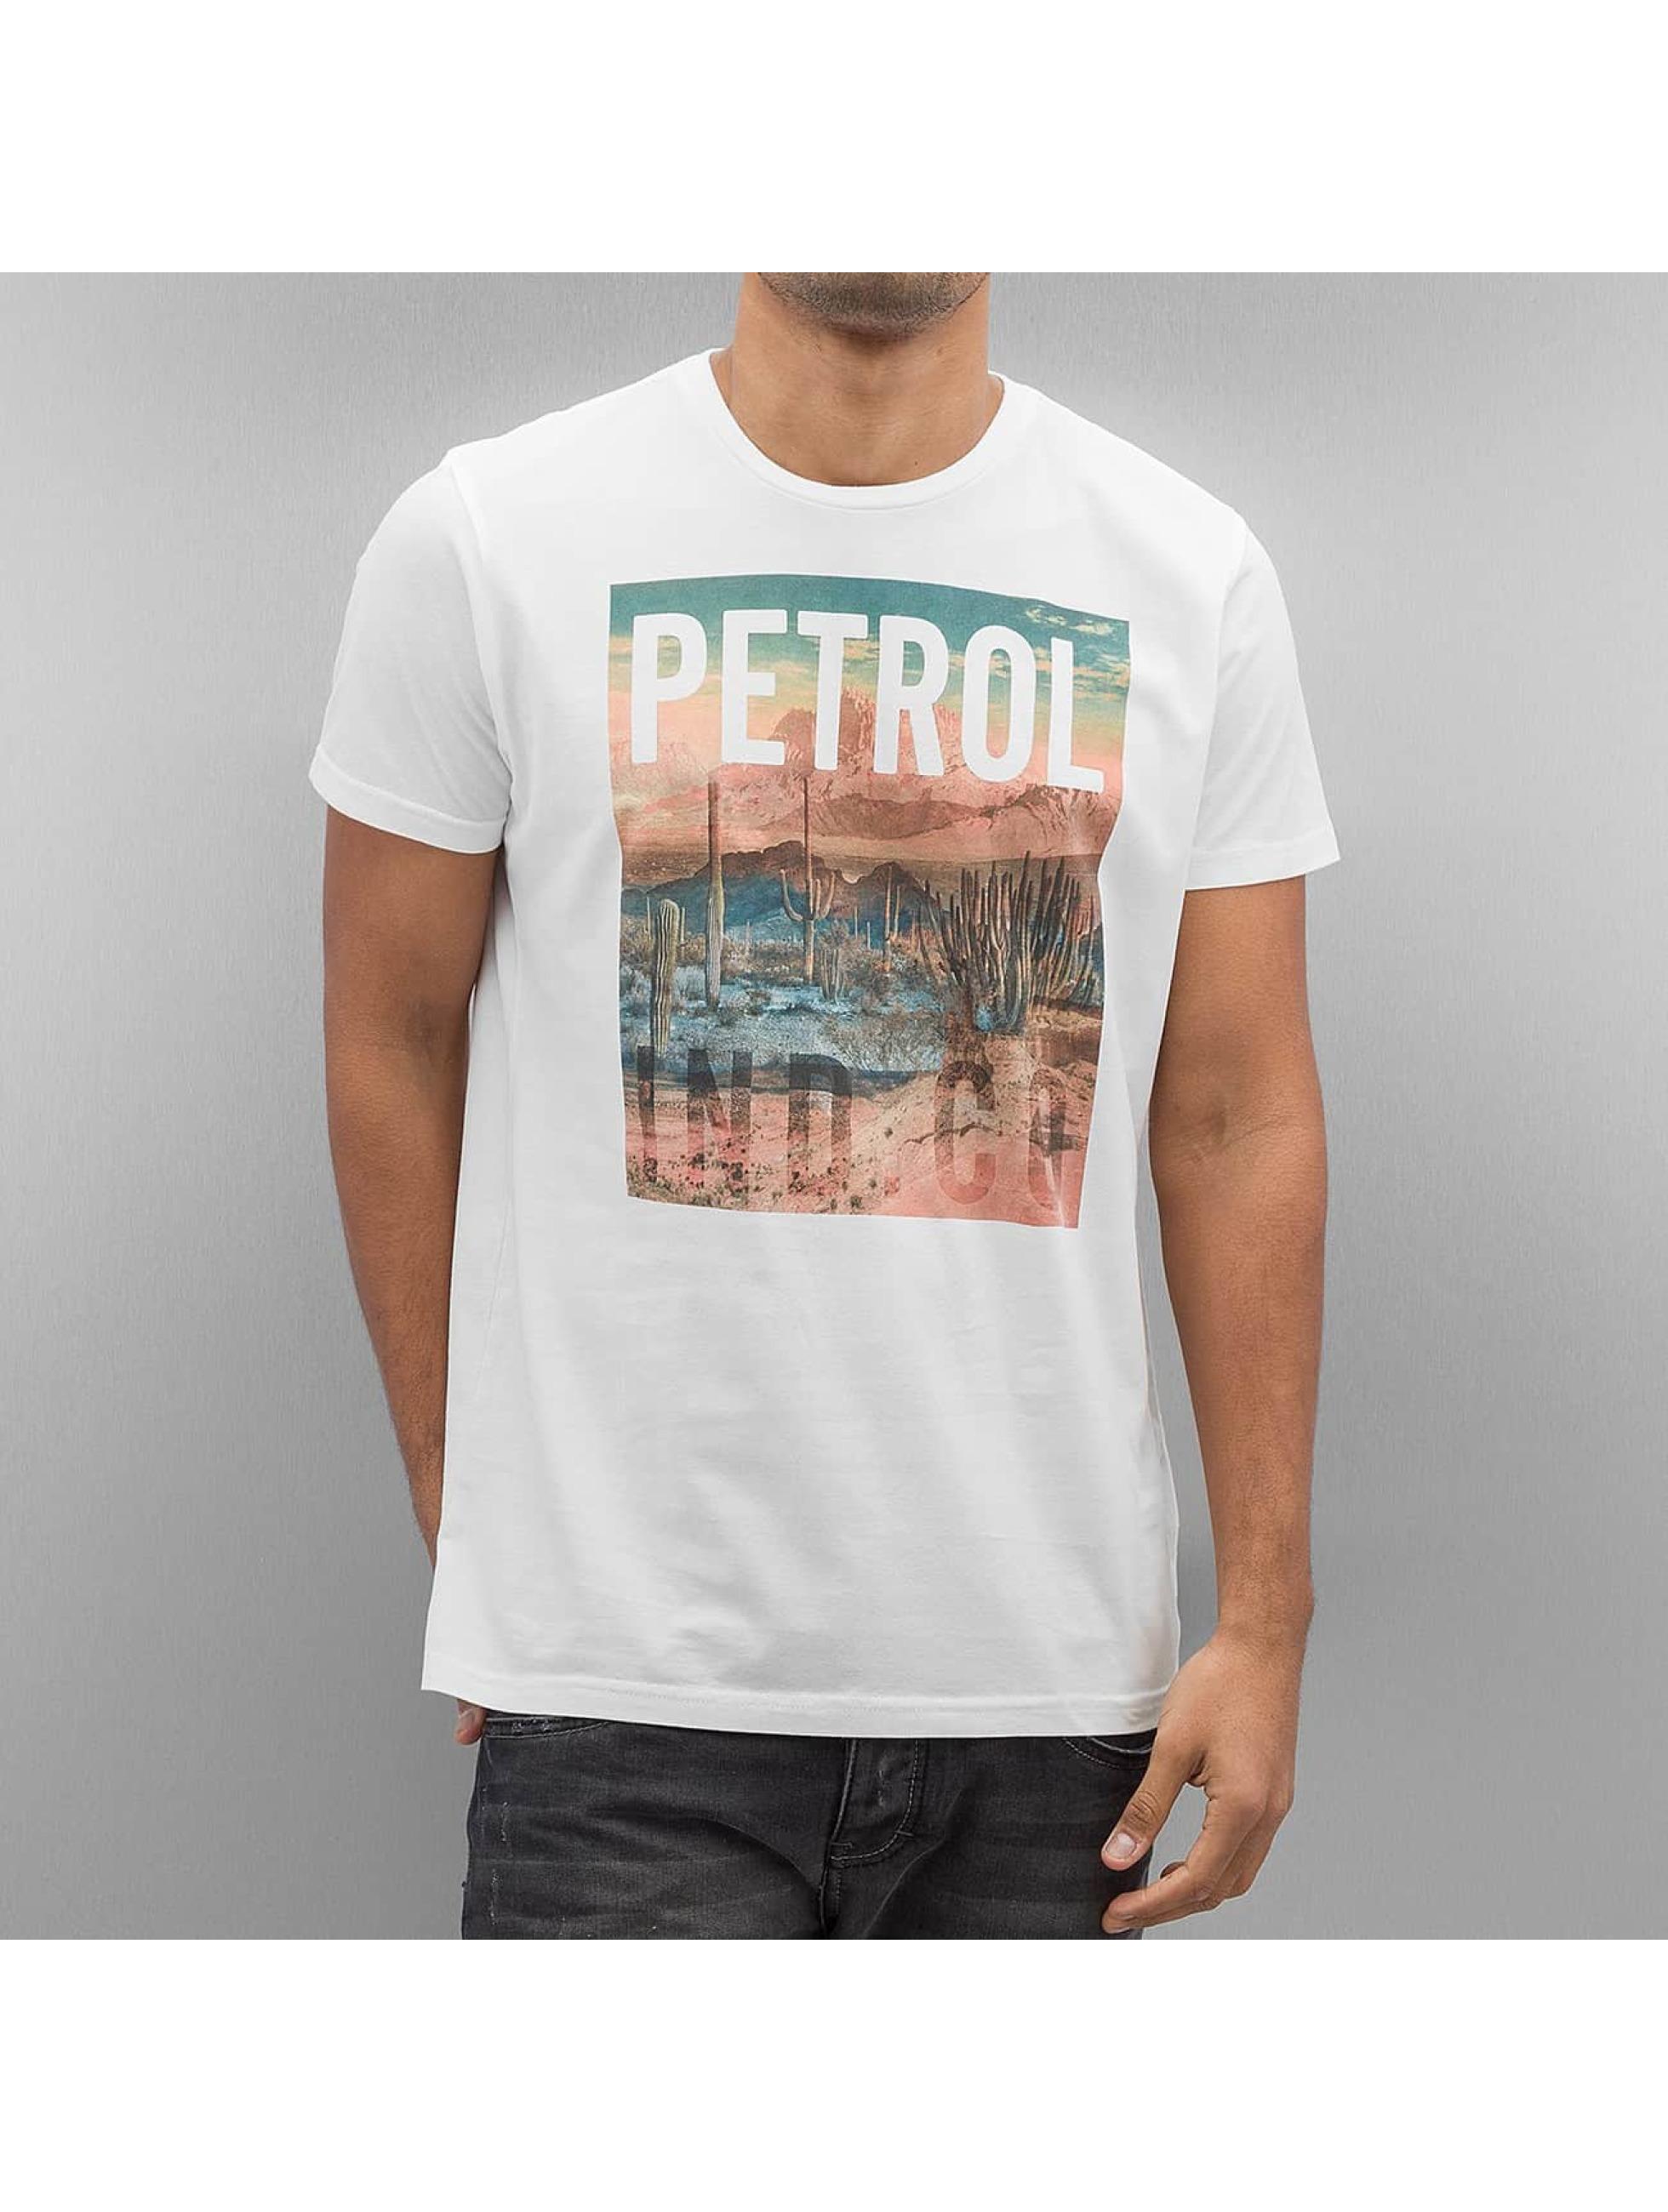 Petrol Industries T-Shirt Bright white